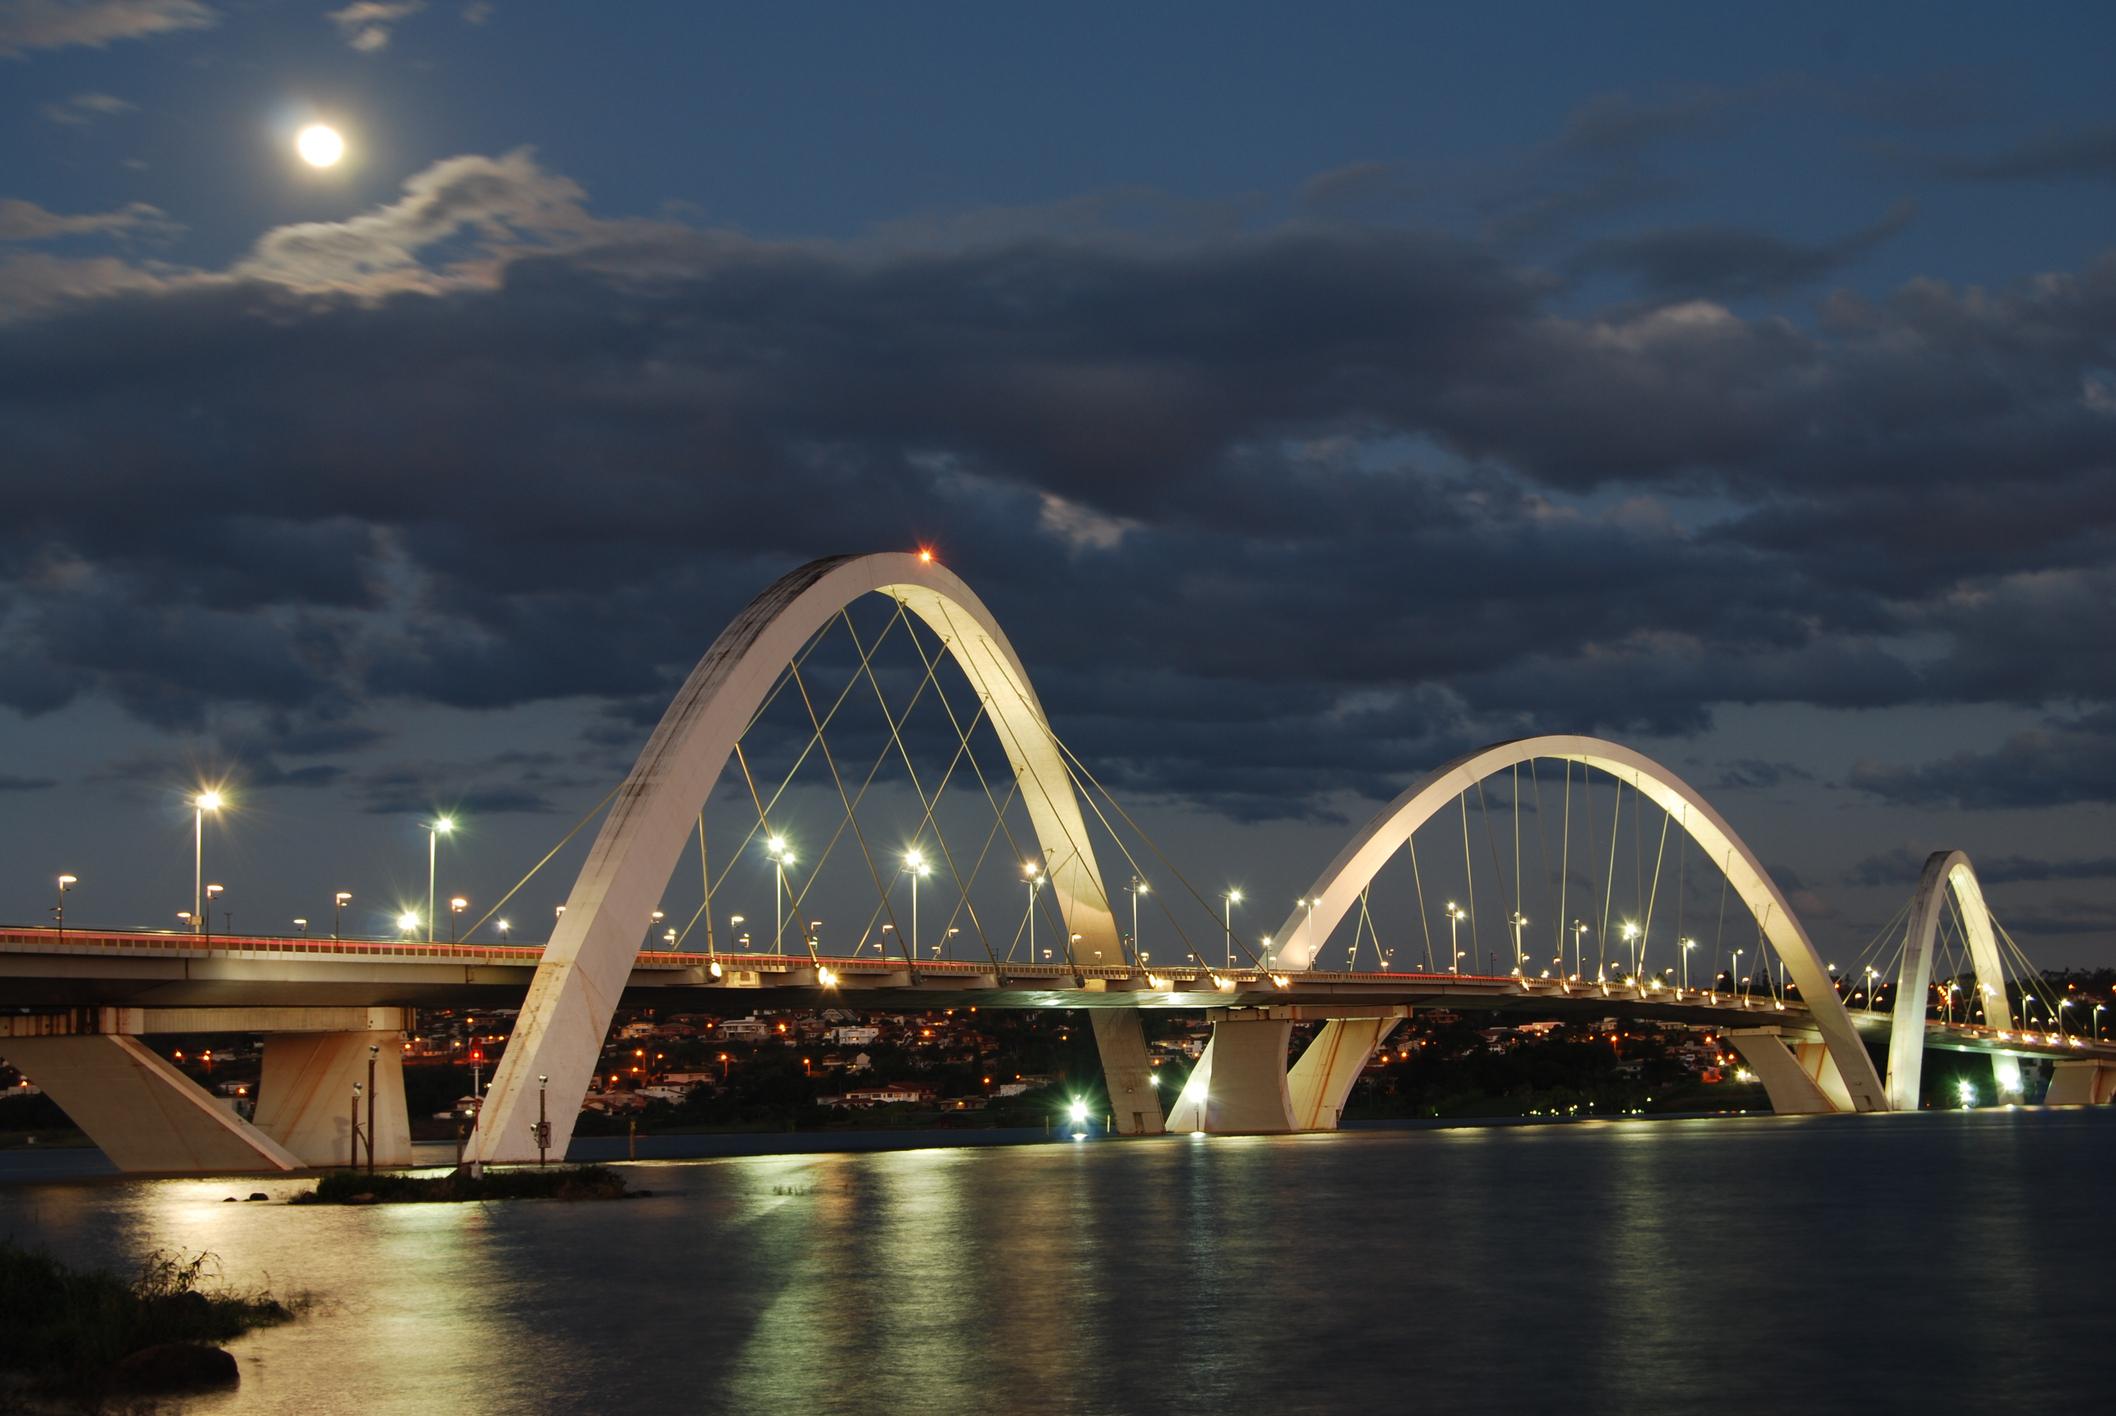 Ponte JK (juscelino Kubitschek Bridge) is one of the three bridges that cross Lake Paranoa in...